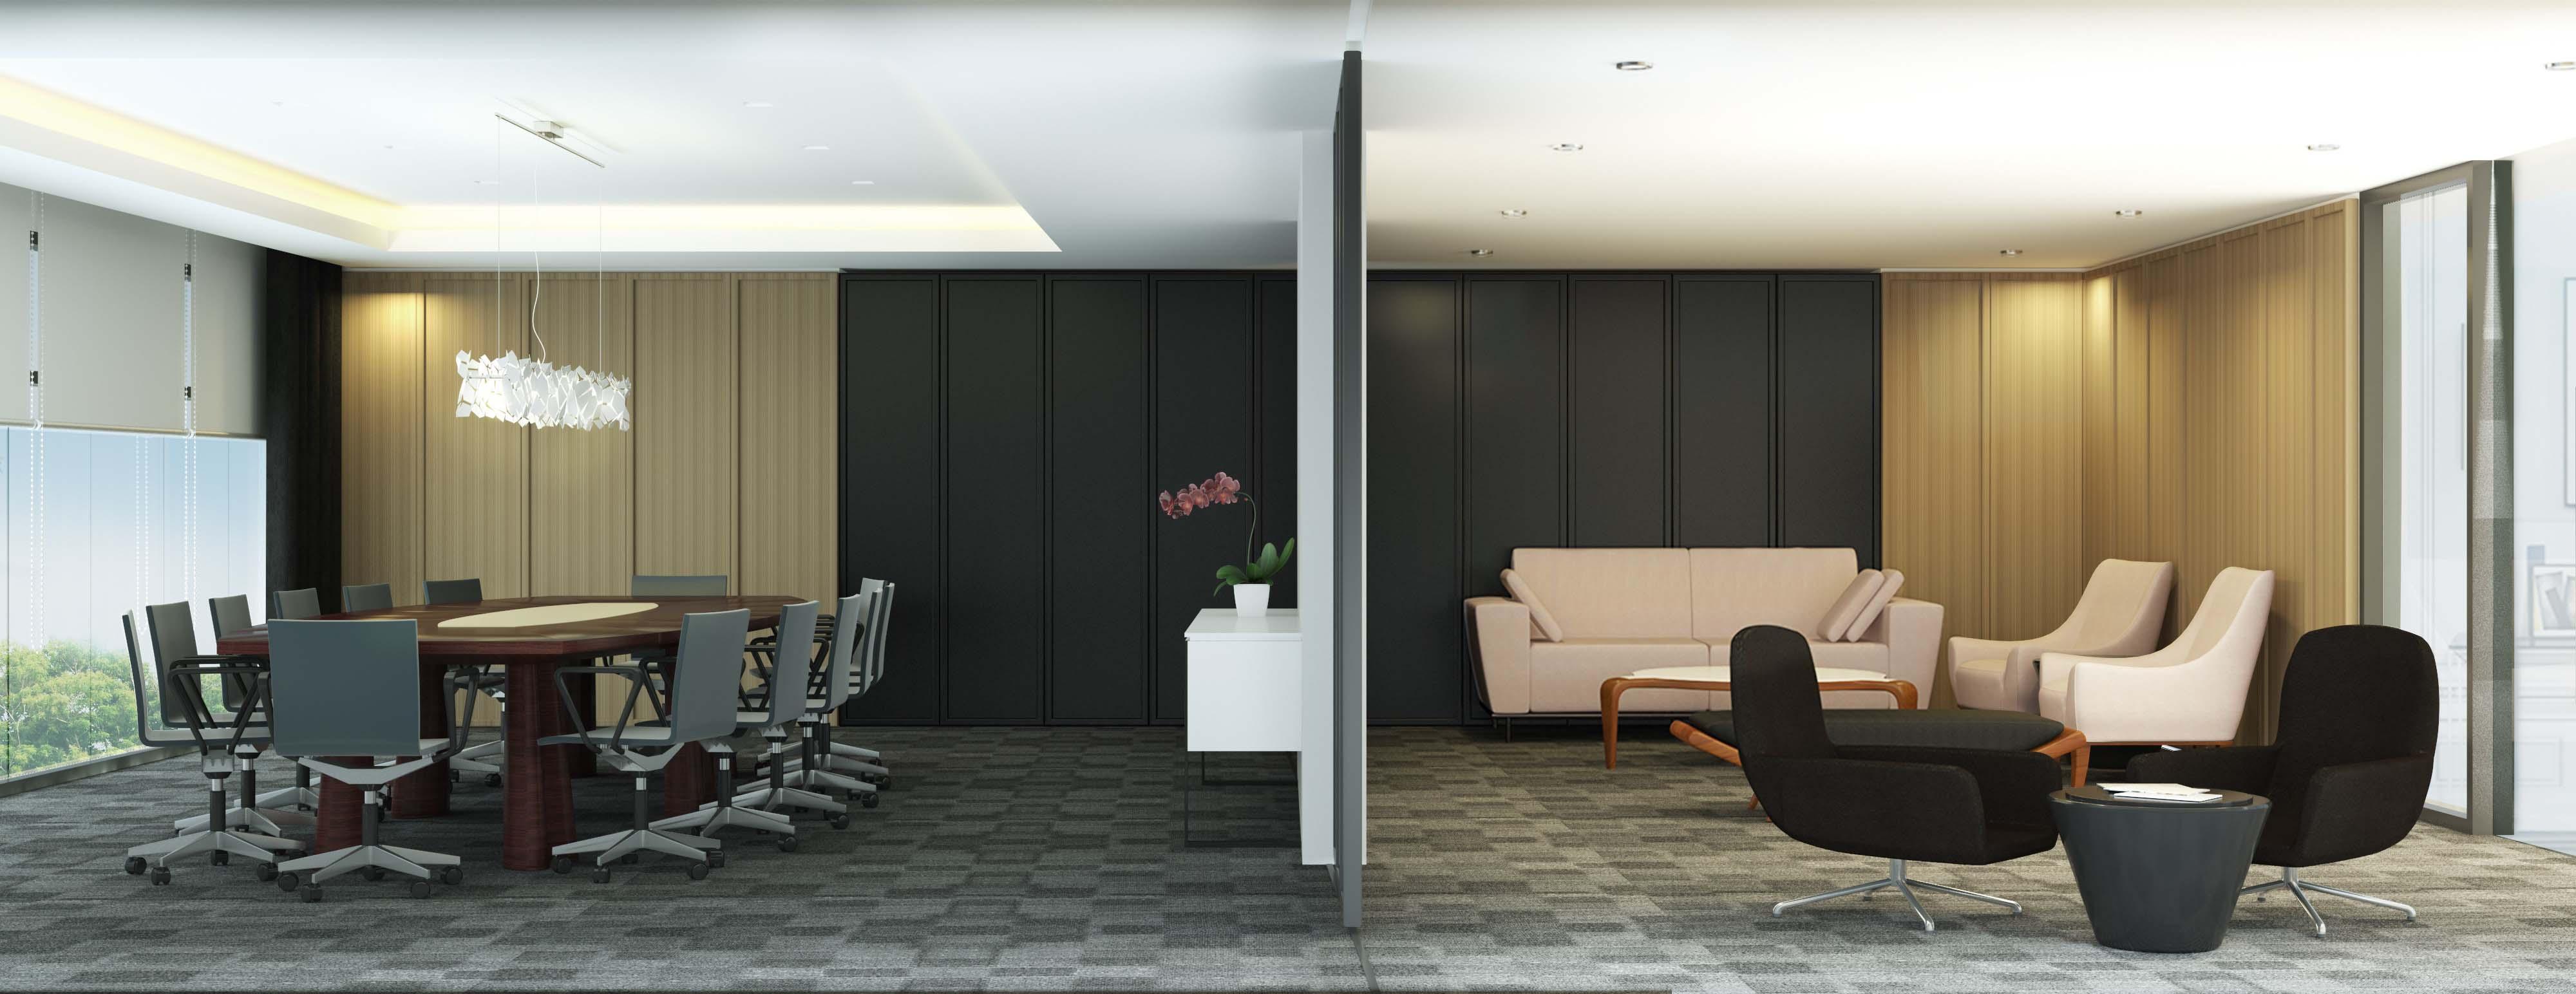 uptown-parksuites-bgc-global-city-condos-for-sale-meetingroom